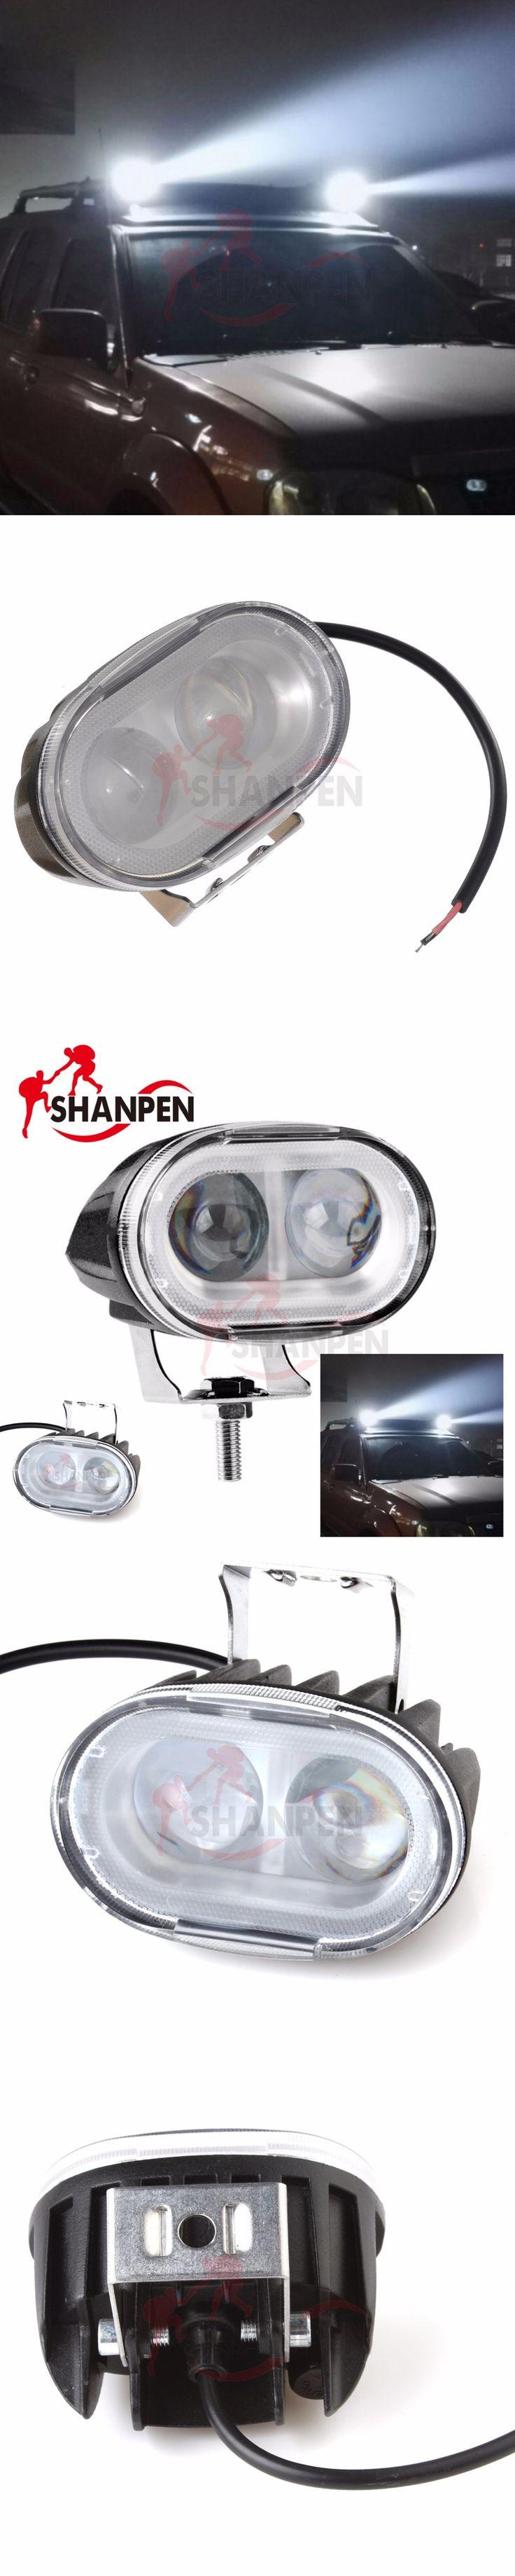 Car headlights and spotlights  Vehicle Off-road 20W 2000LM 9V-30V Car LED Work Light Driving Lamp 4WD ATV SUV